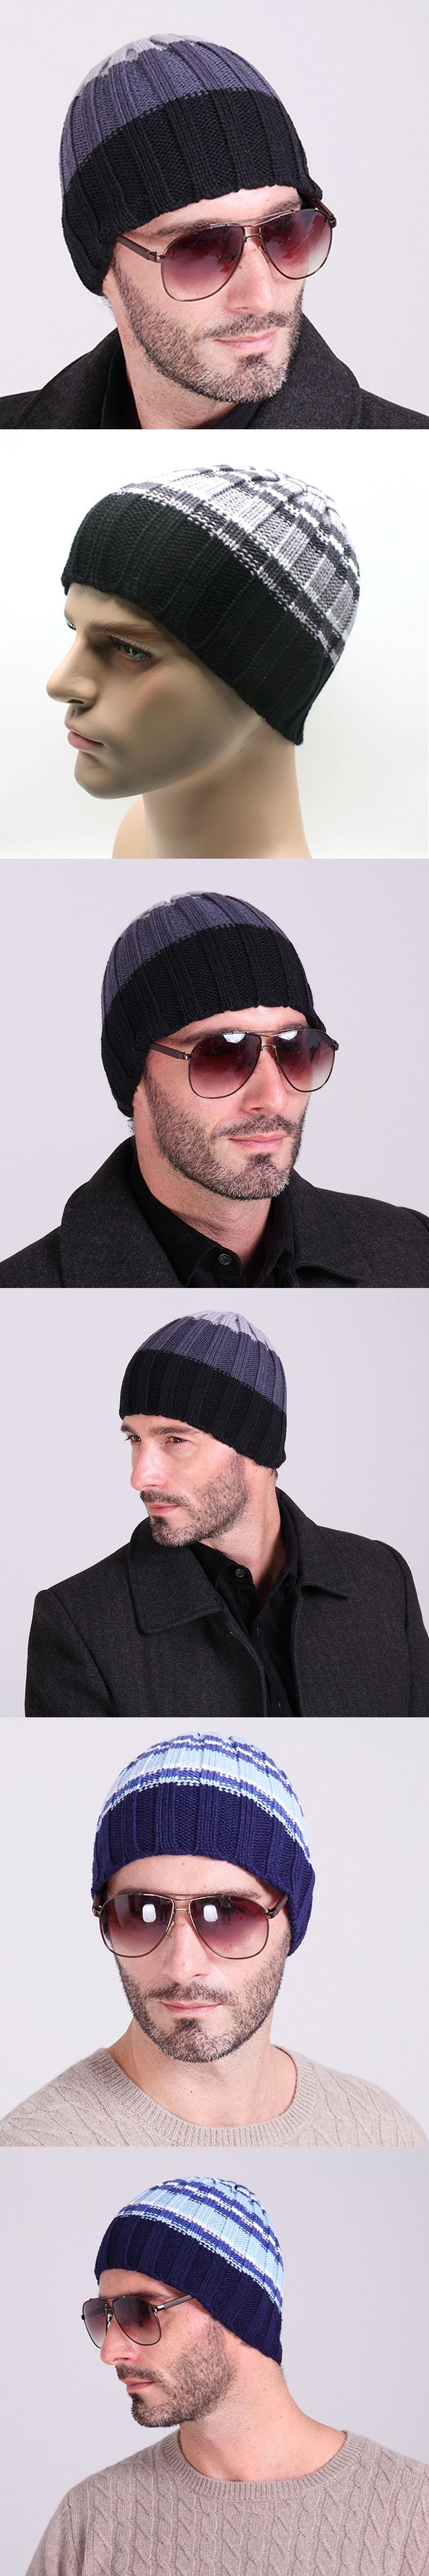 Women men beanie hat winter knitted caps and hats fashion brand skull female winter wool knitted skull beanies mens hat